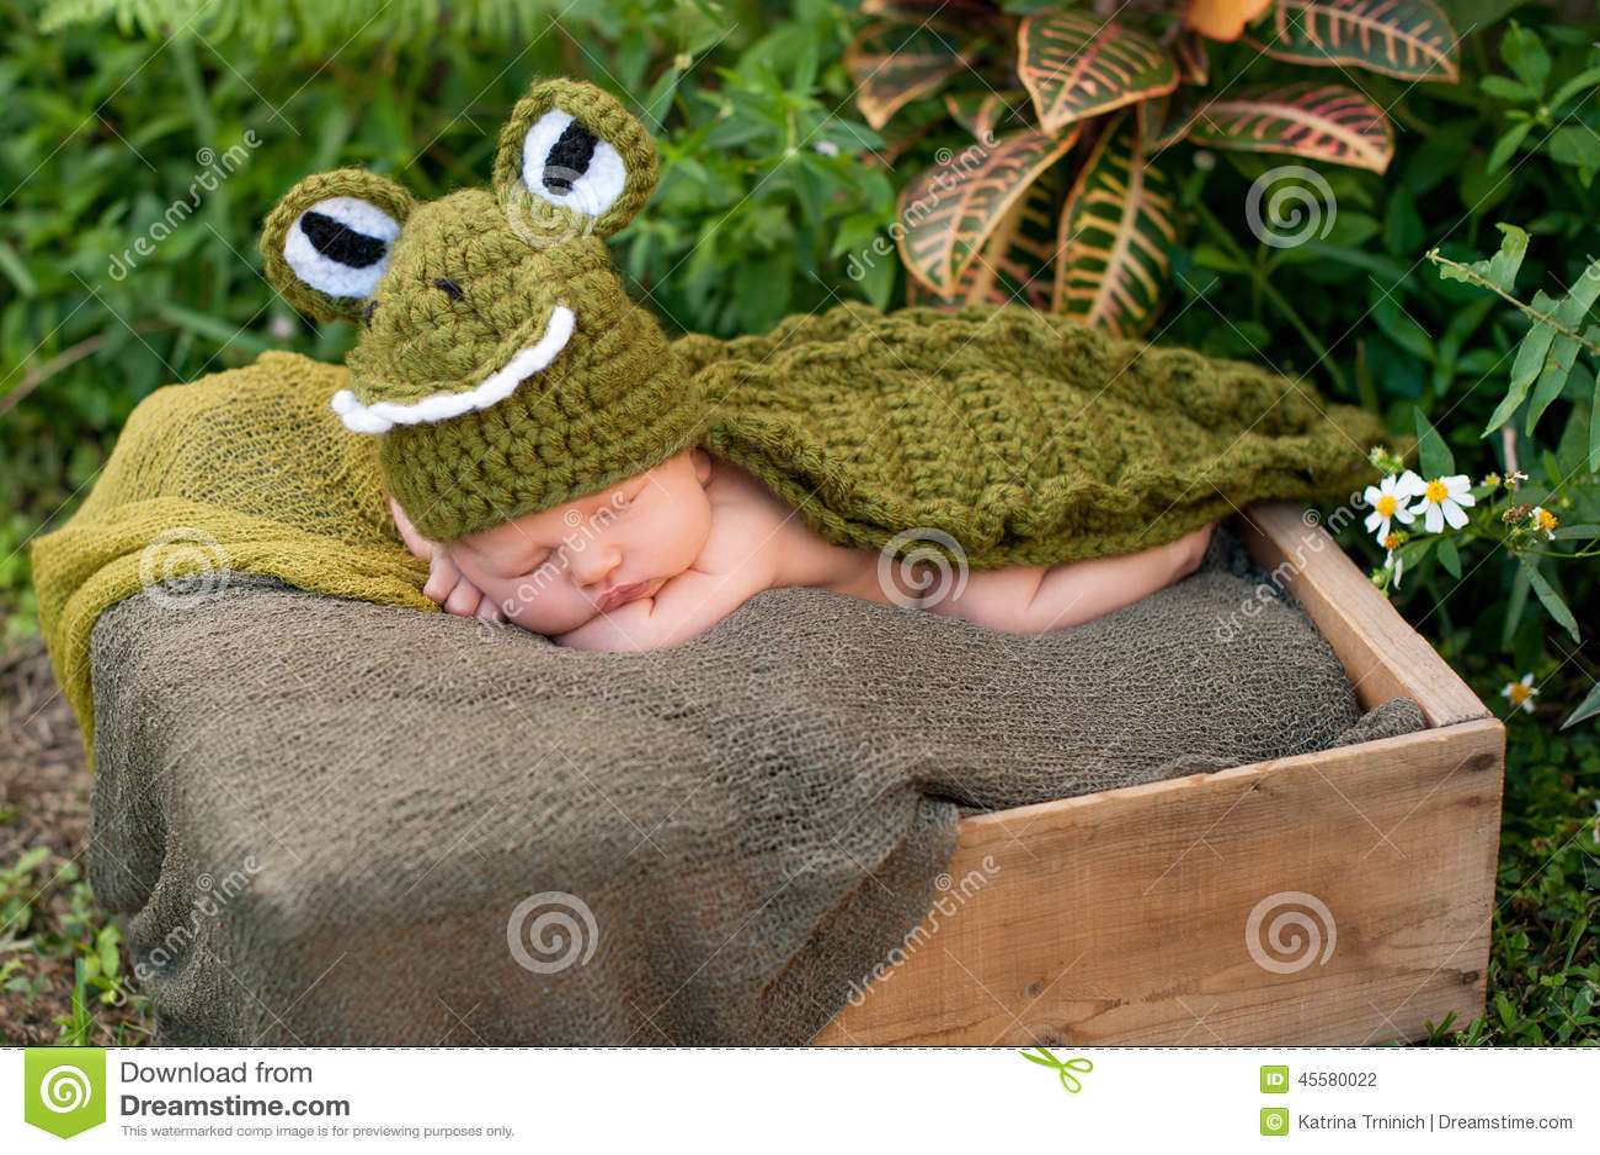 b9979acf09a2e Newborn Baby Wearing An Alligator Costume Stock Photo - Image of ...